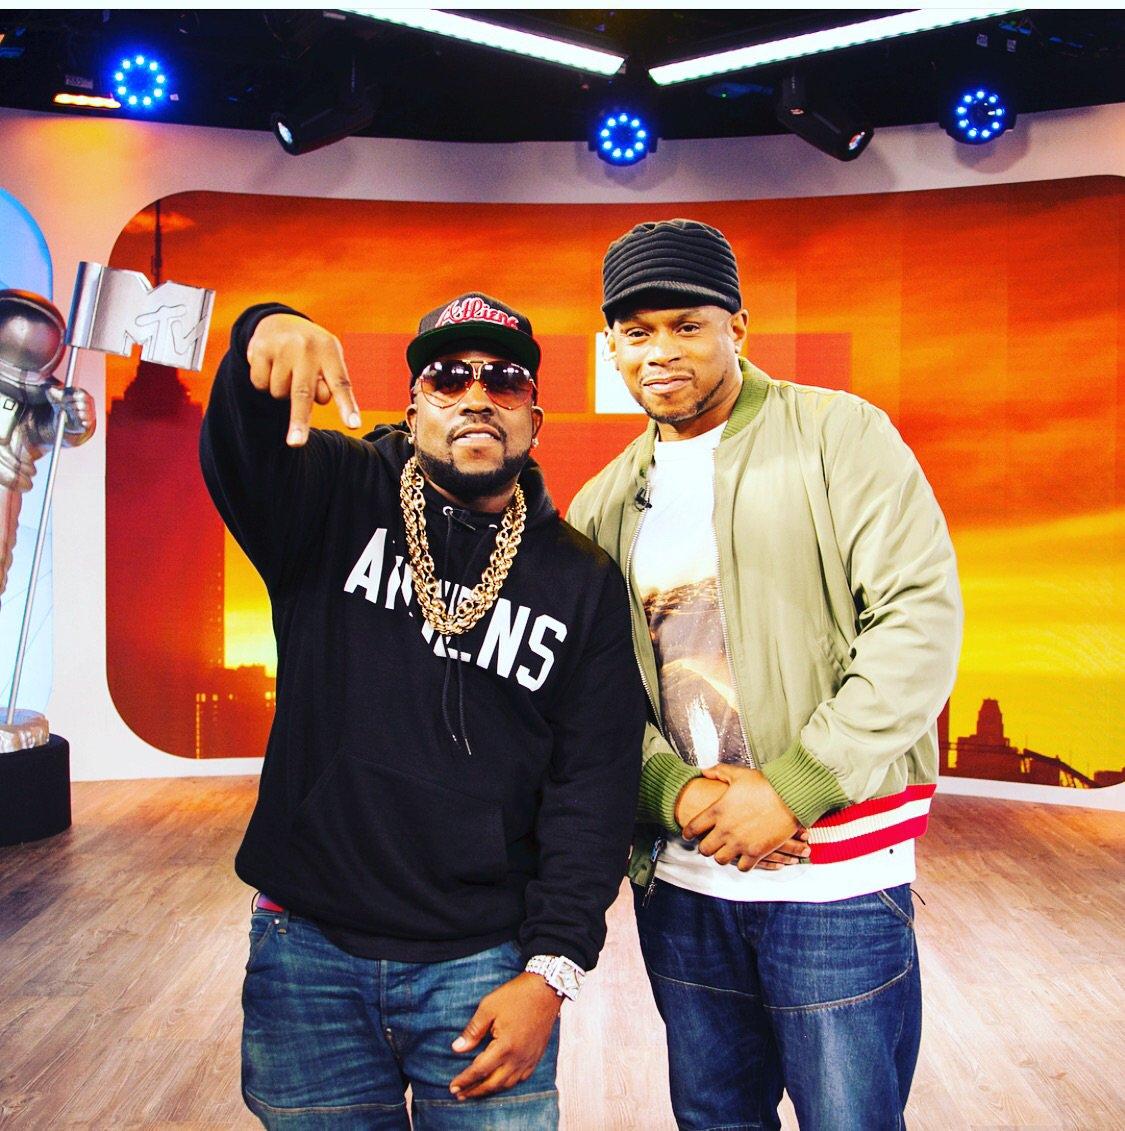 Tune into @TRL on @MTV Right Now ! #Weoutchea https://t.co/uSingCVAtK